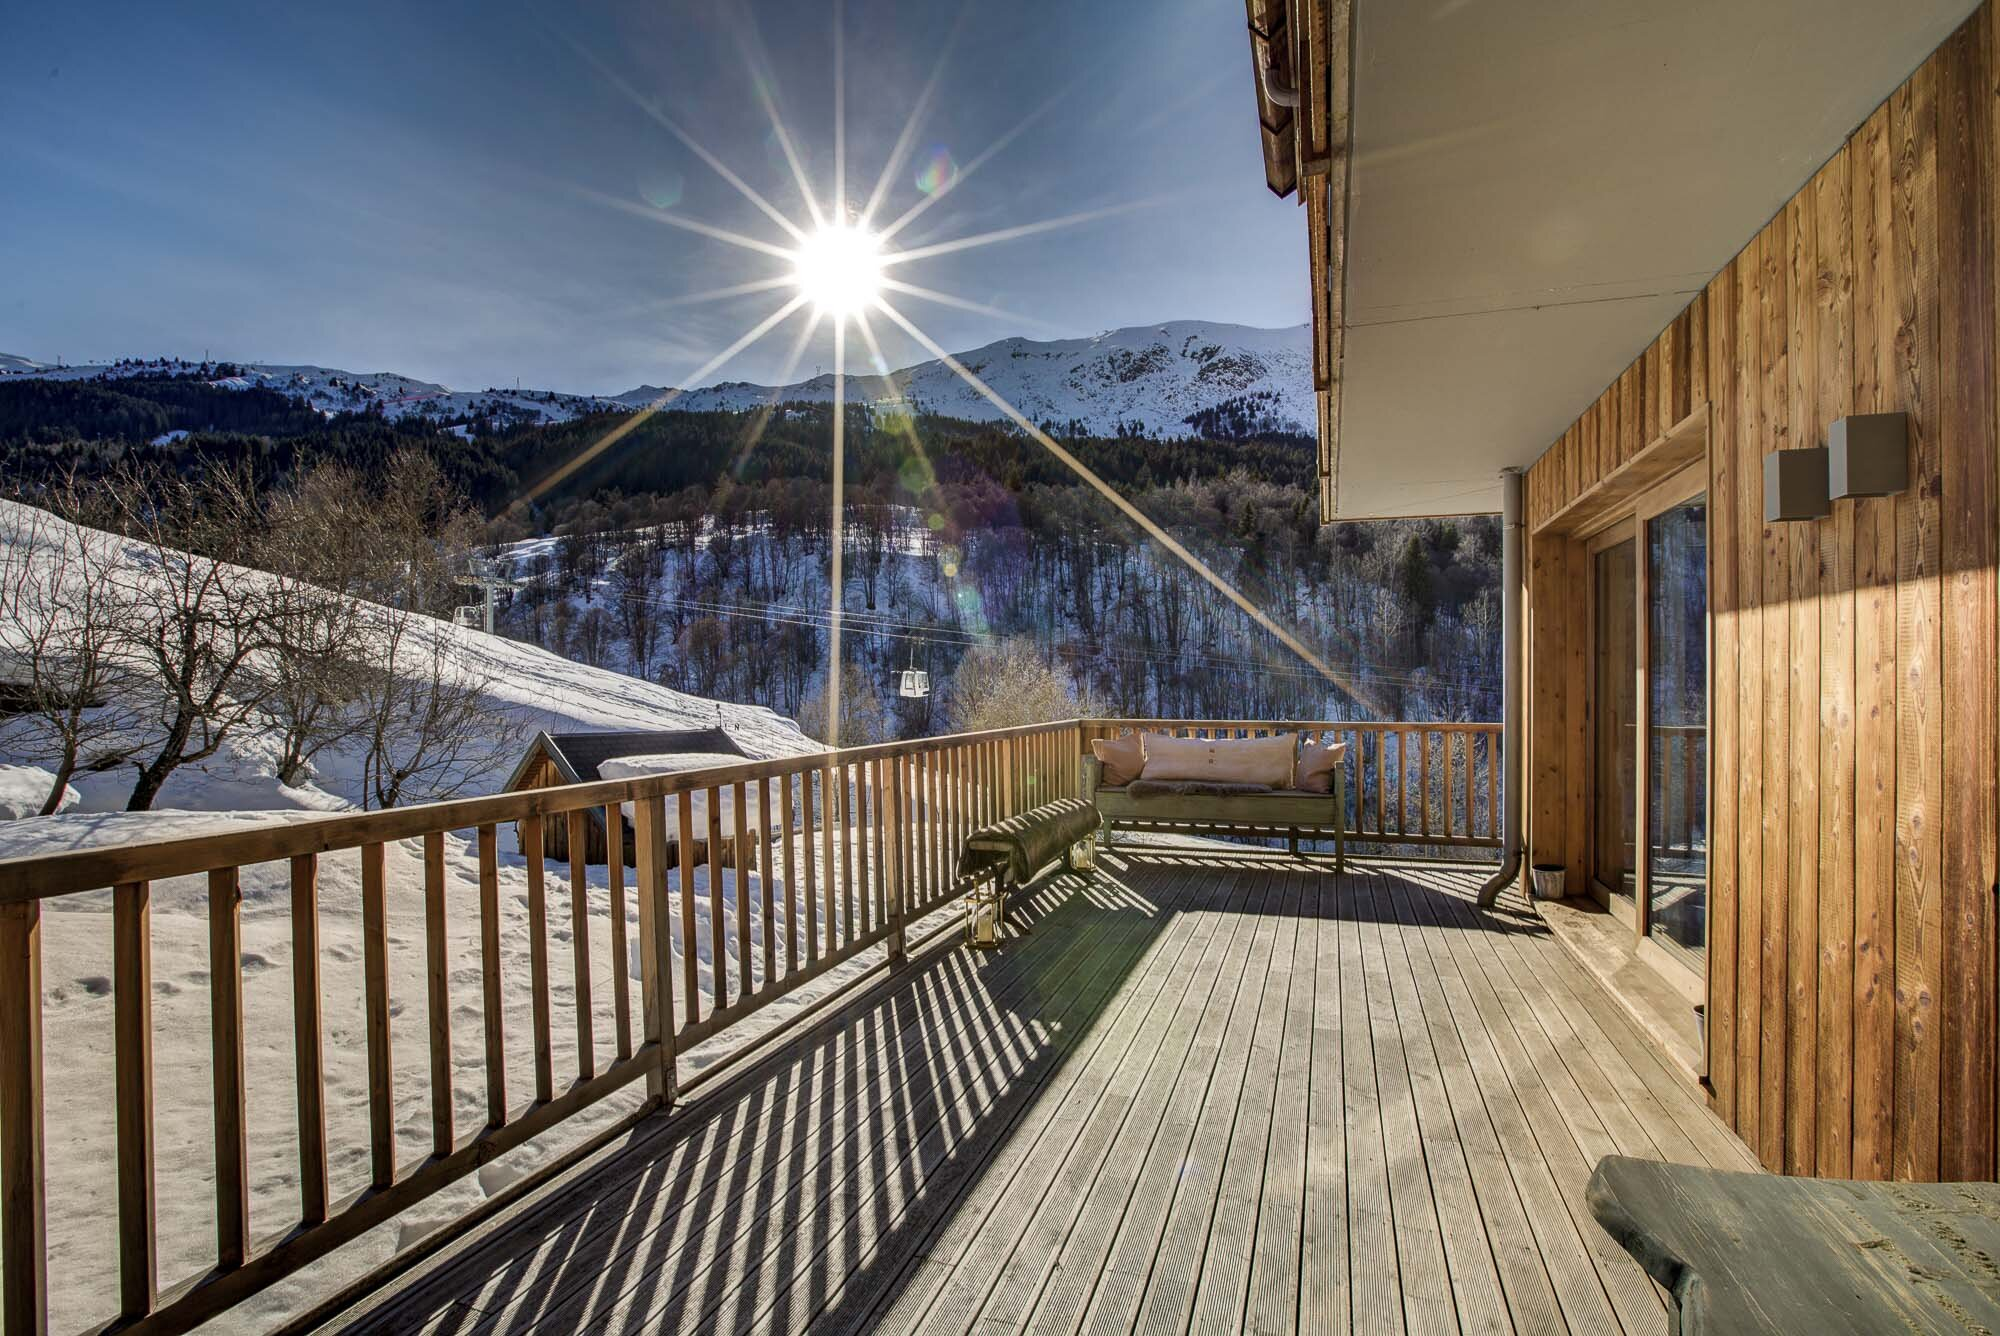 tg-ski-luxury-chalet-lightbowne-meribel-005.jpg